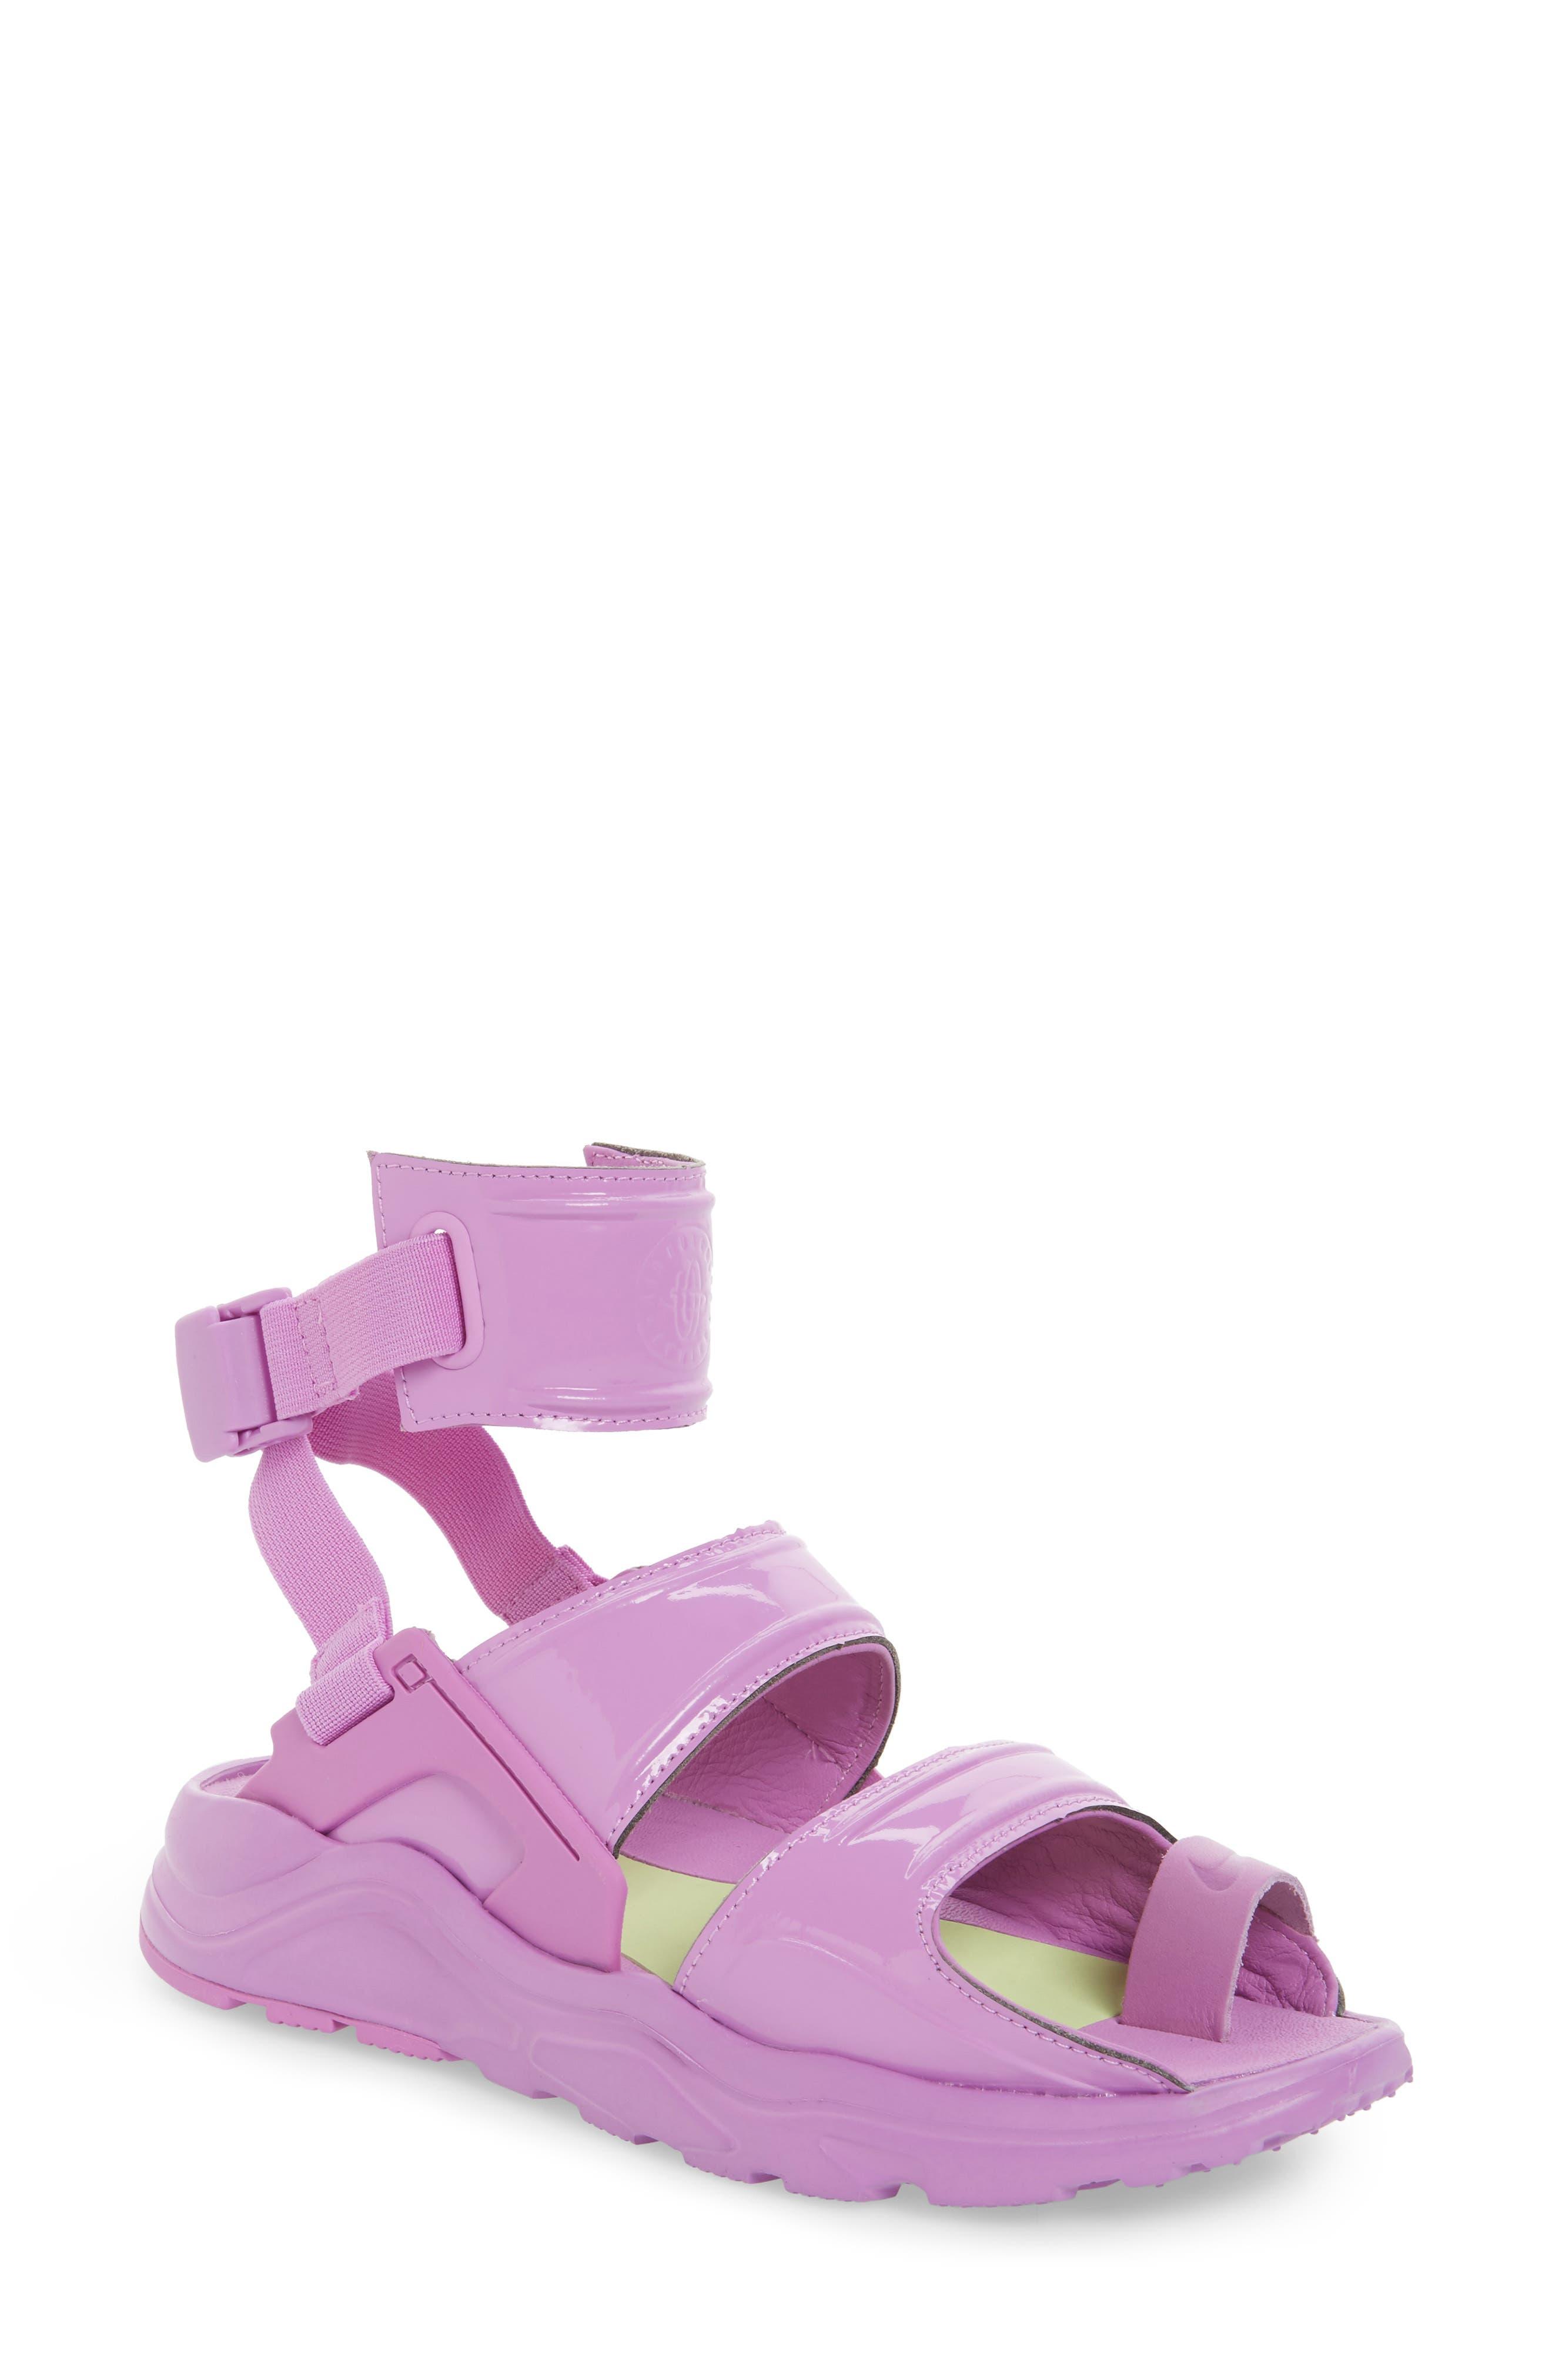 Air Huarache Gladiator Sandal,                             Main thumbnail 2, color,